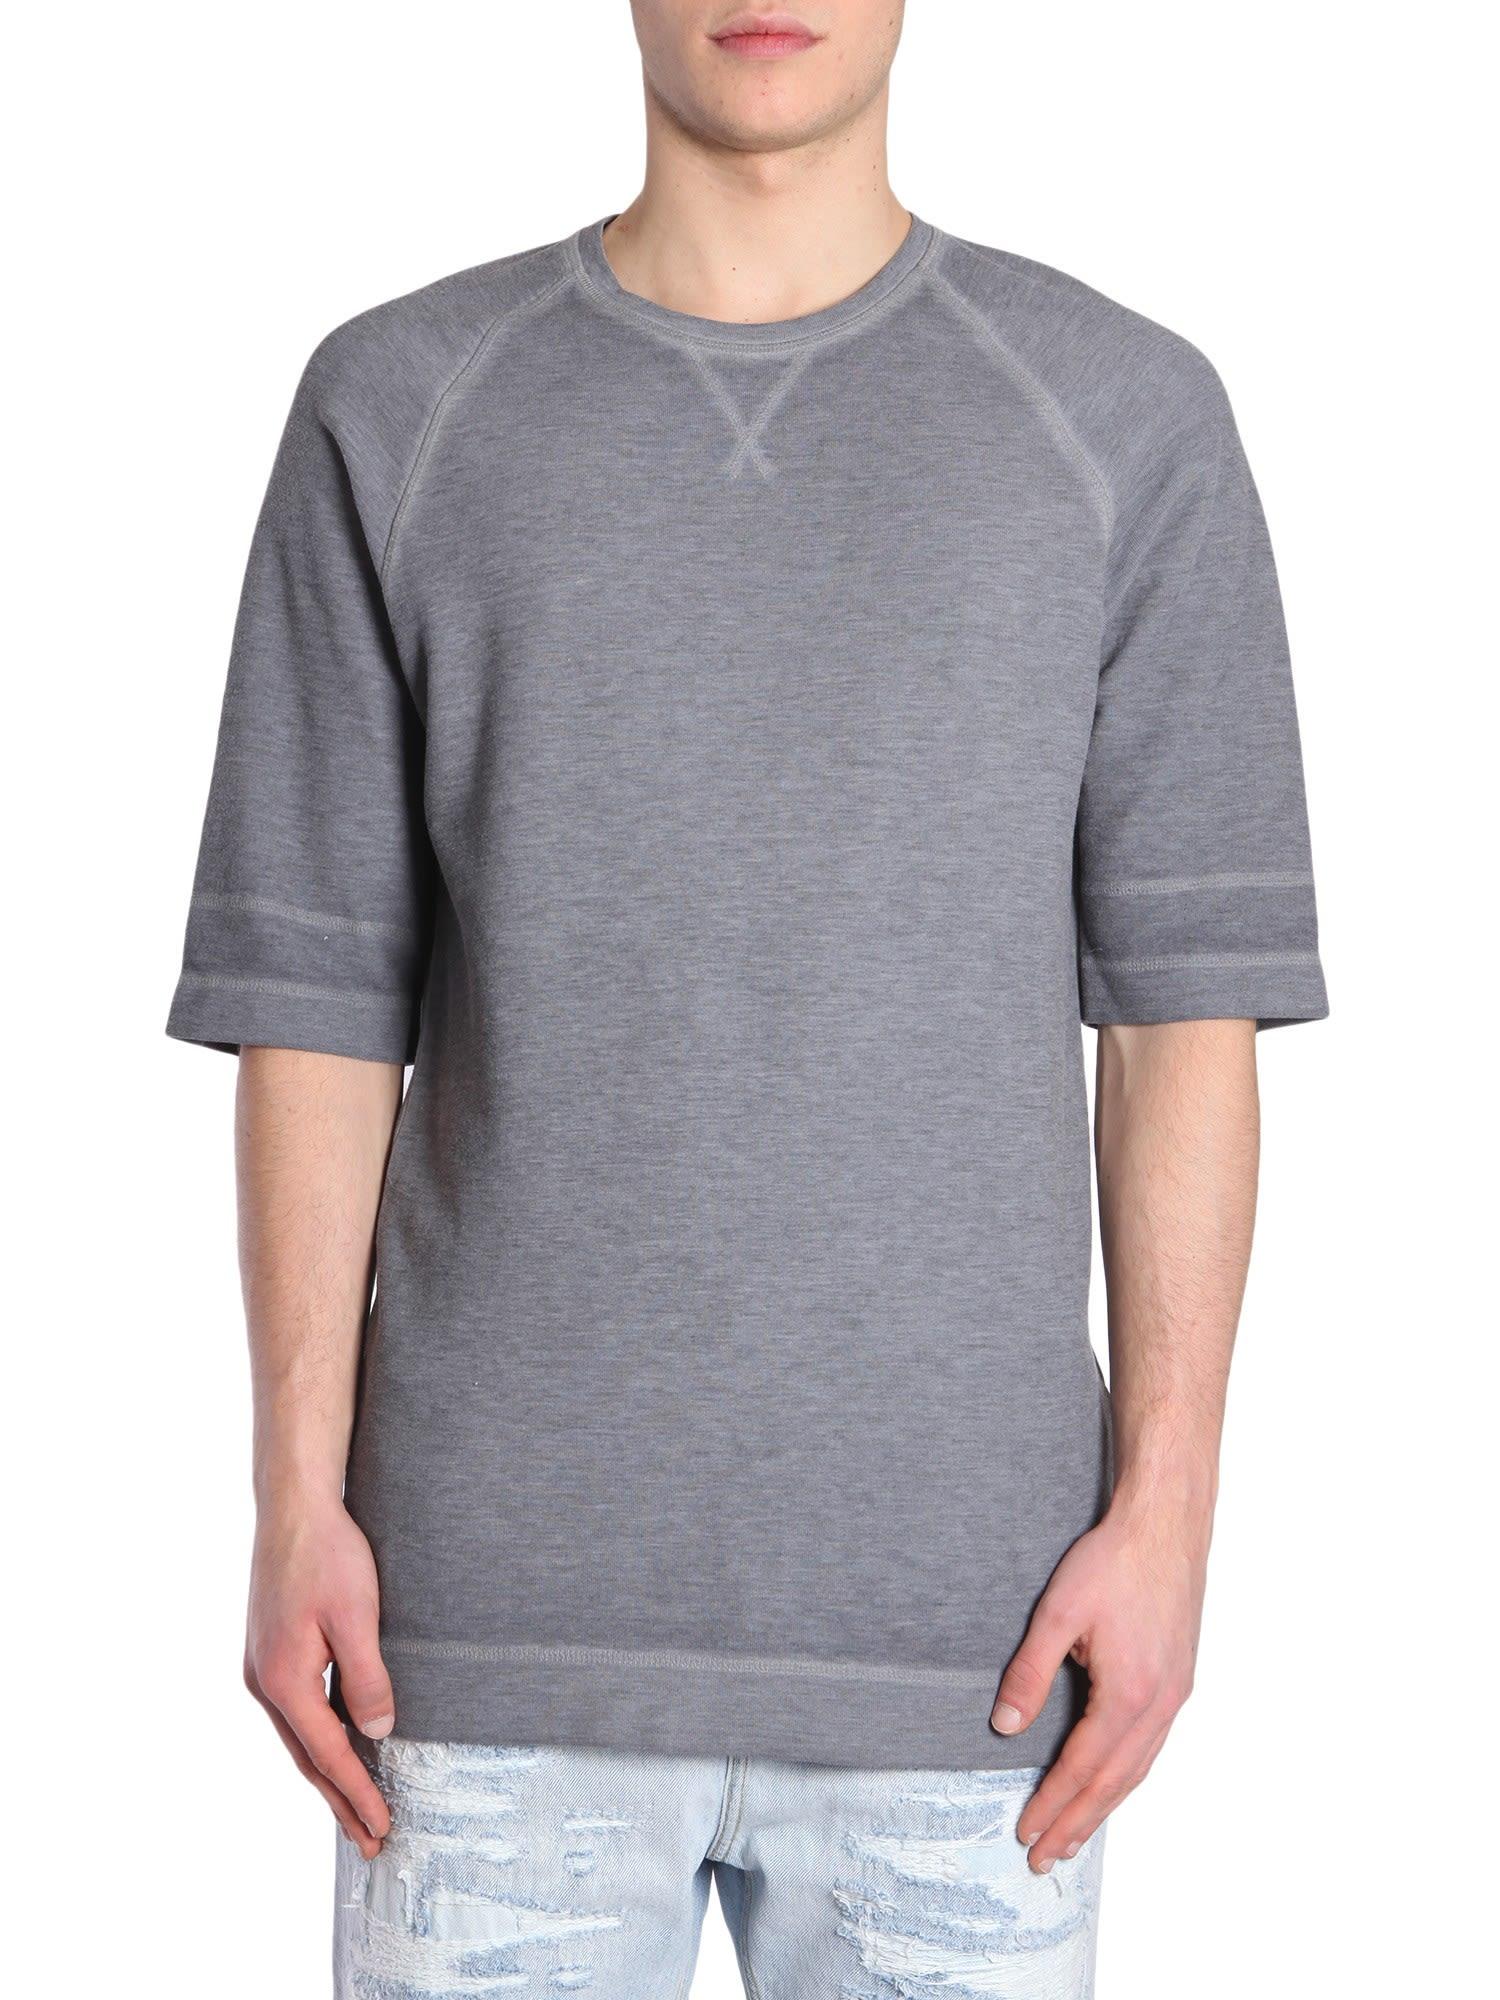 T-shirt Tucky